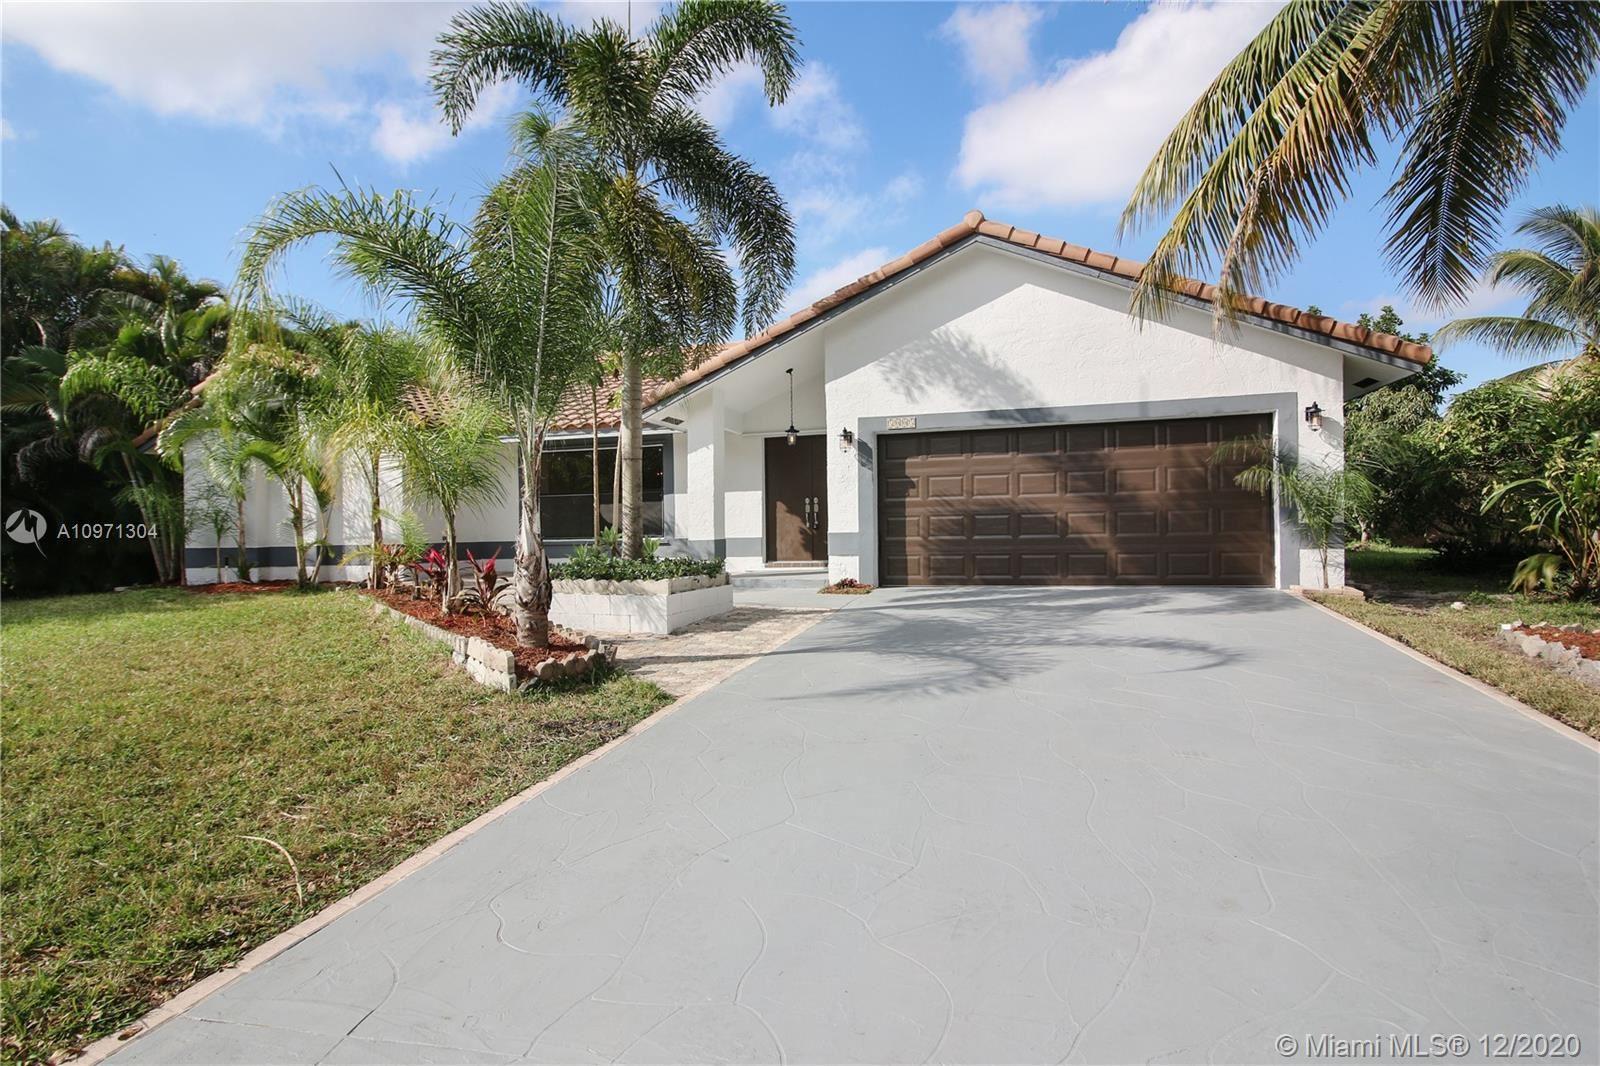 5005 NW 50th St, Coconut Creek, FL 33073 - #: A10971304